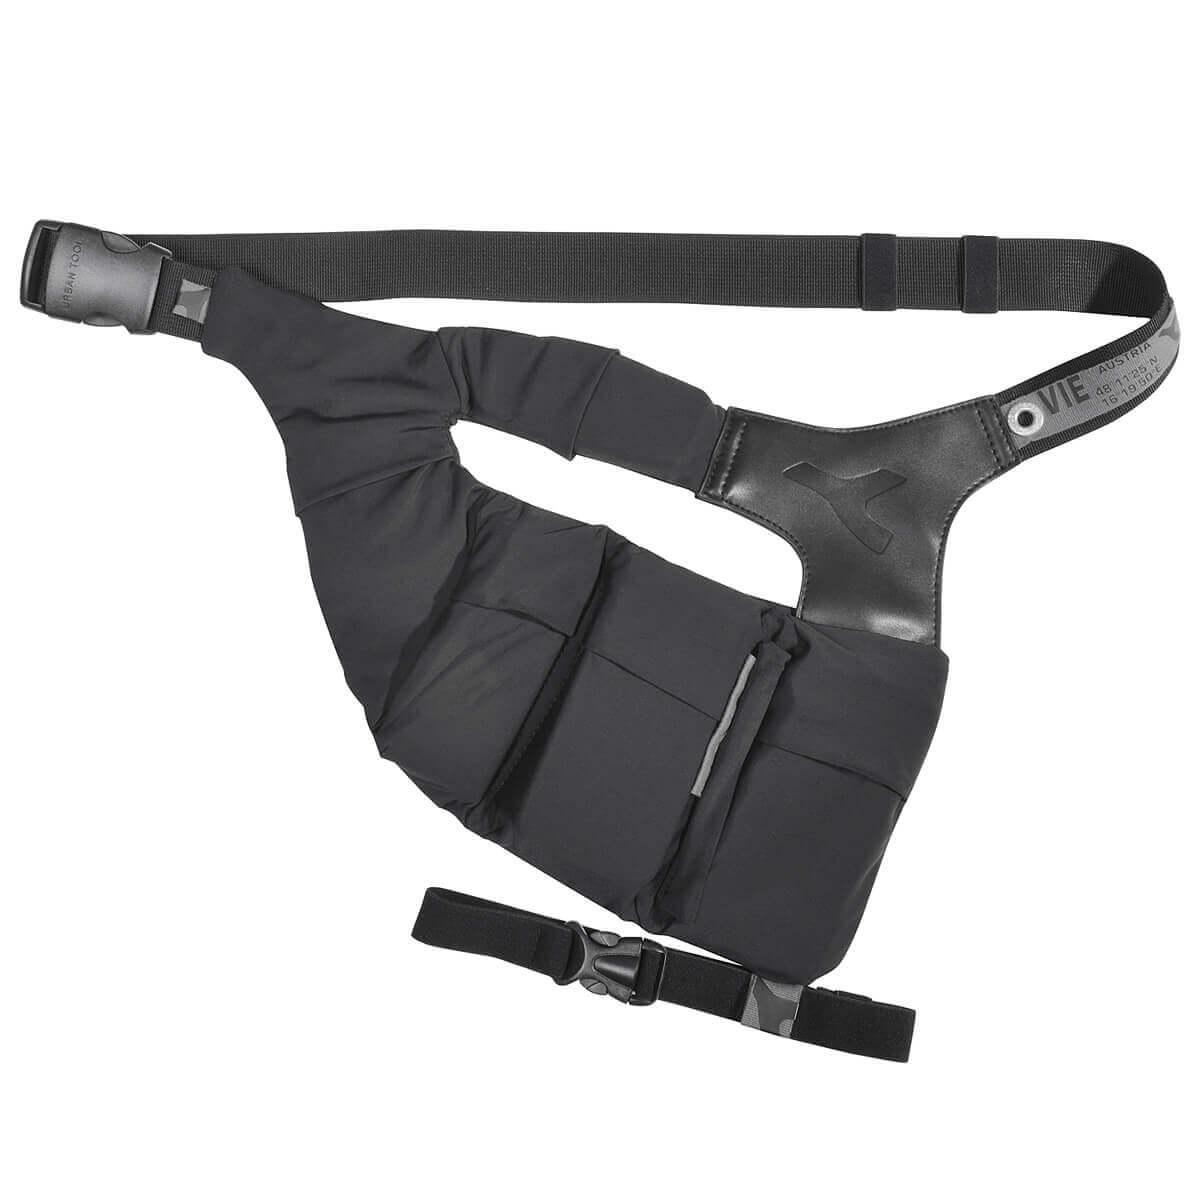 Waist bag for men and women